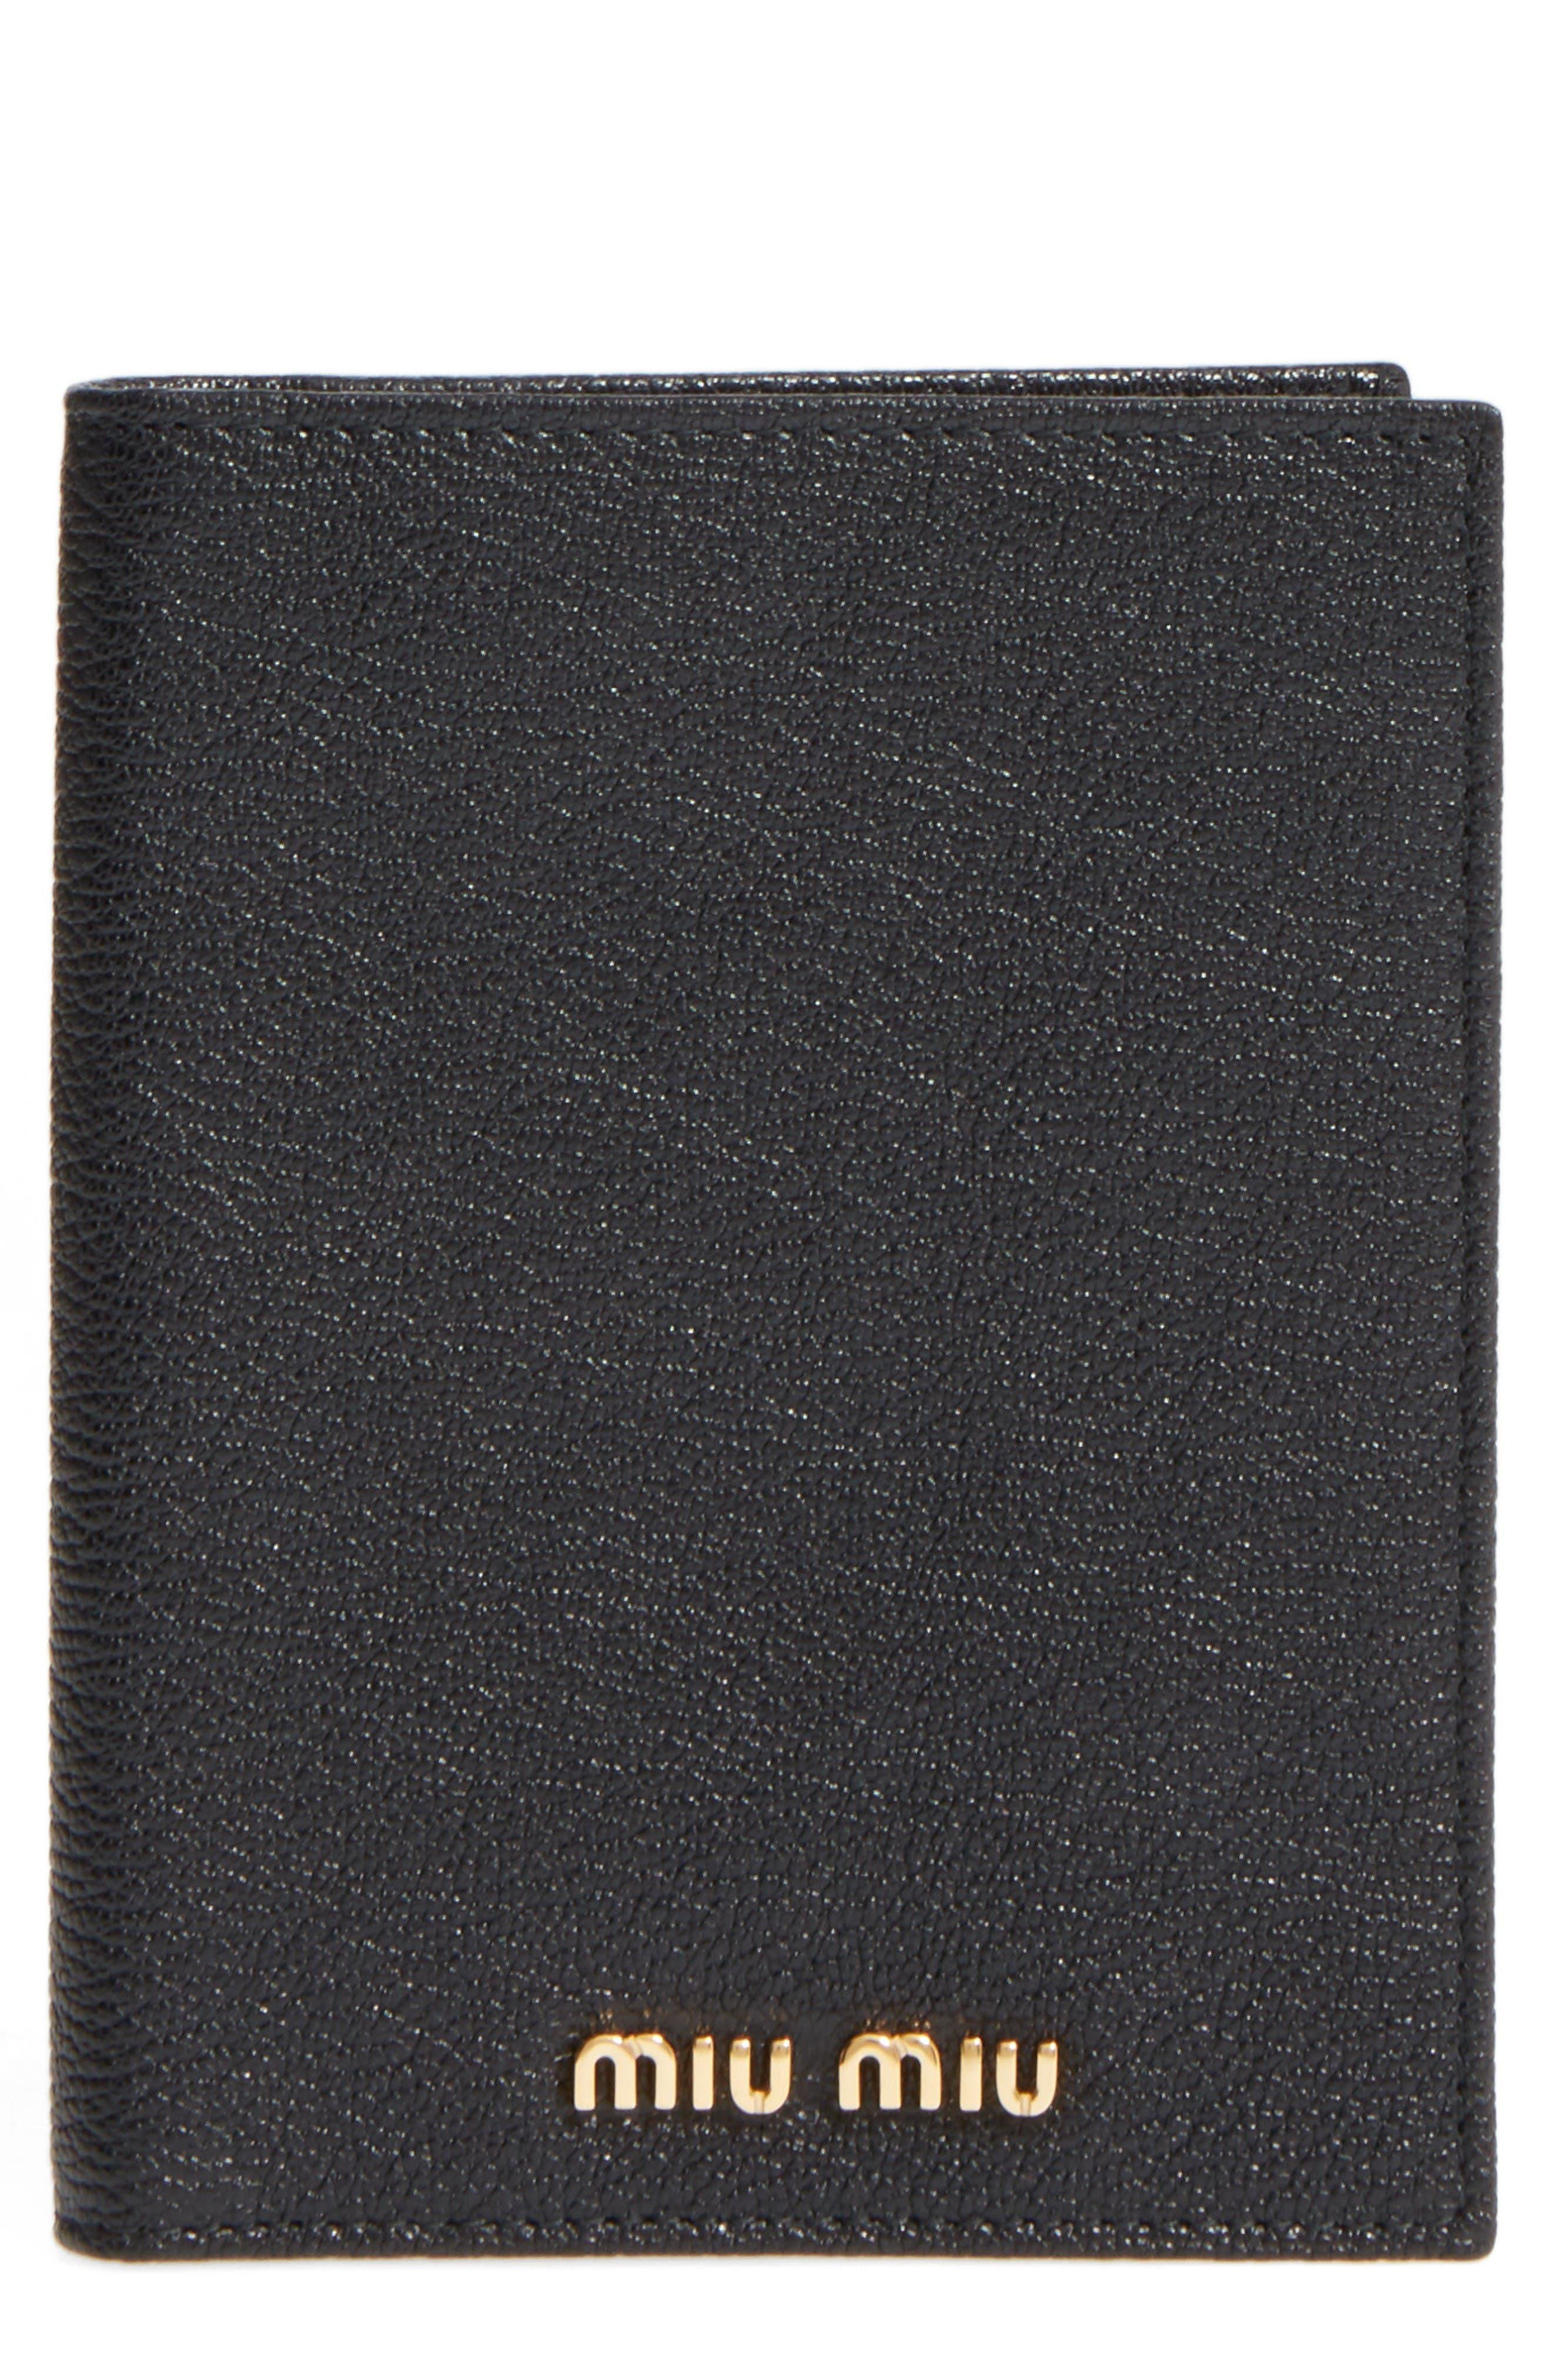 Main Image - Miu Miu Leather Passport Case